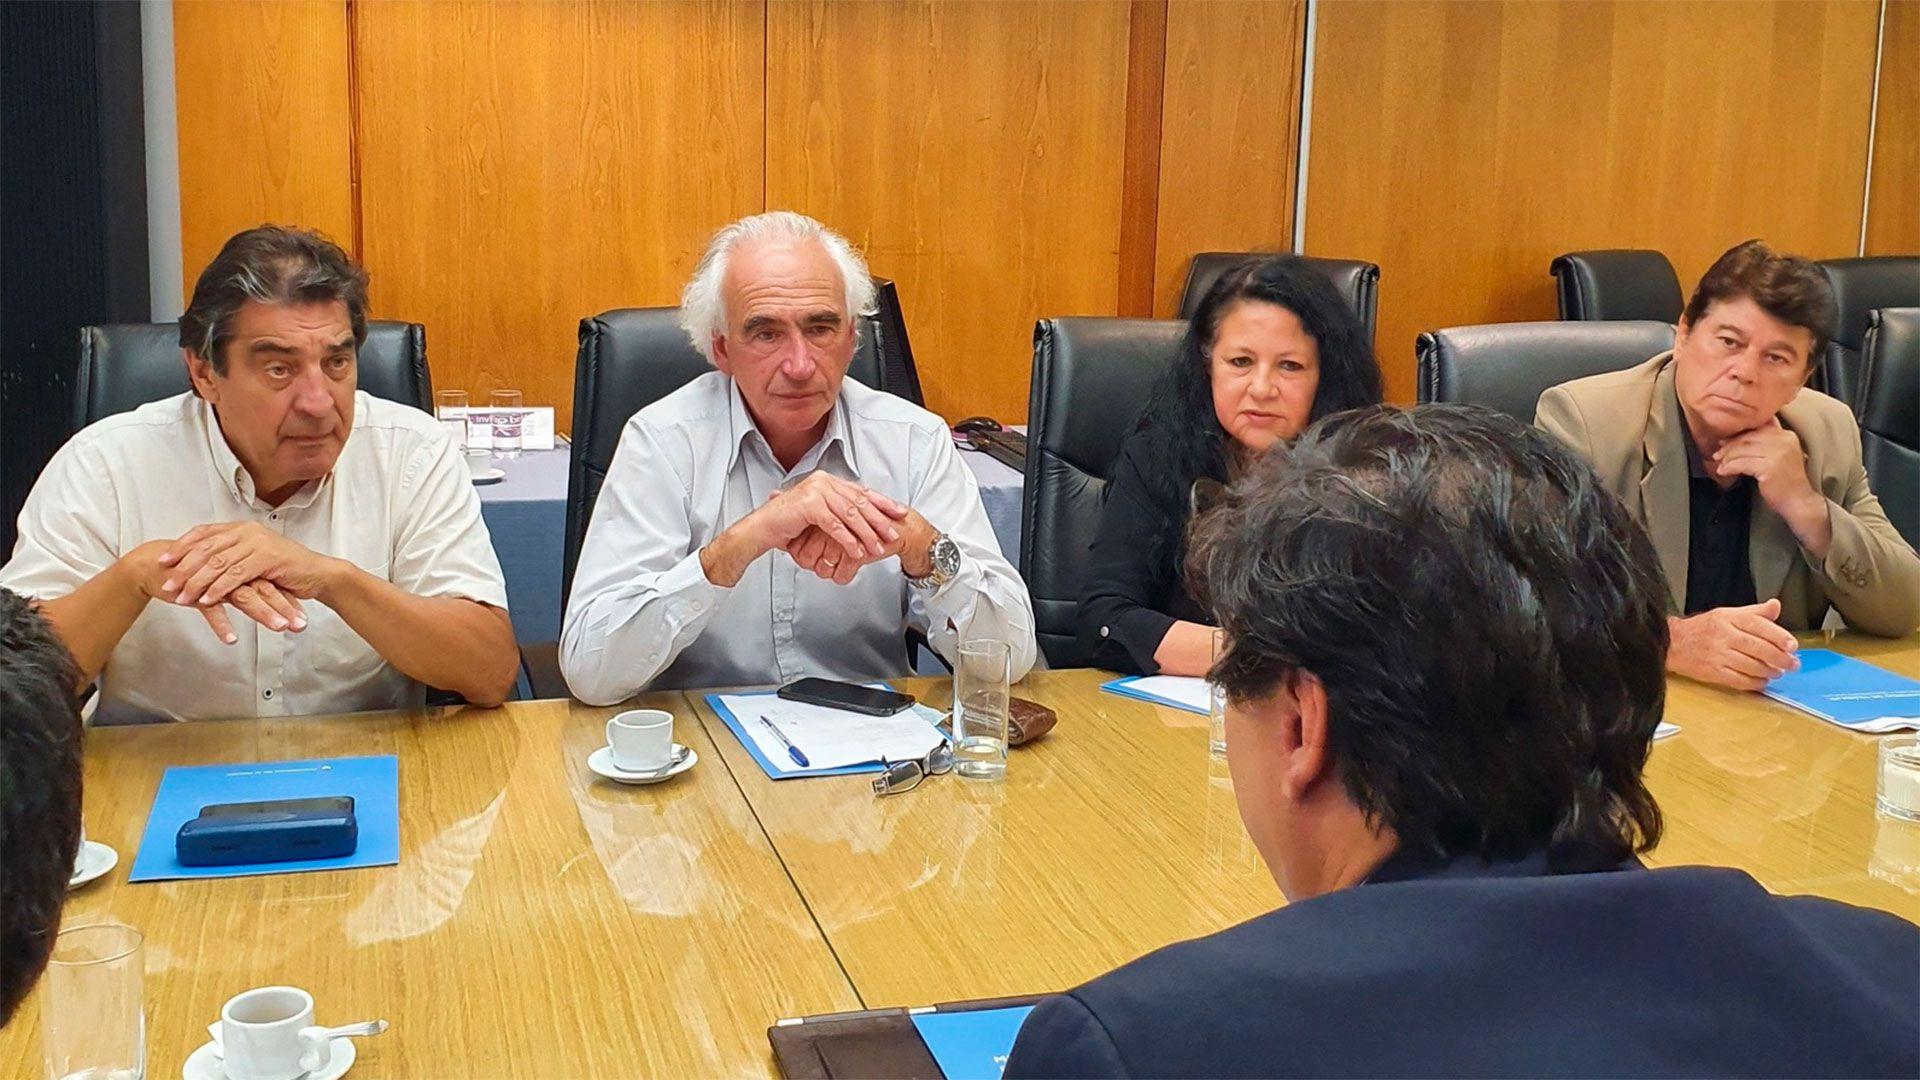 Dirigentes de la CTA Autónoma con el ministro Moroni